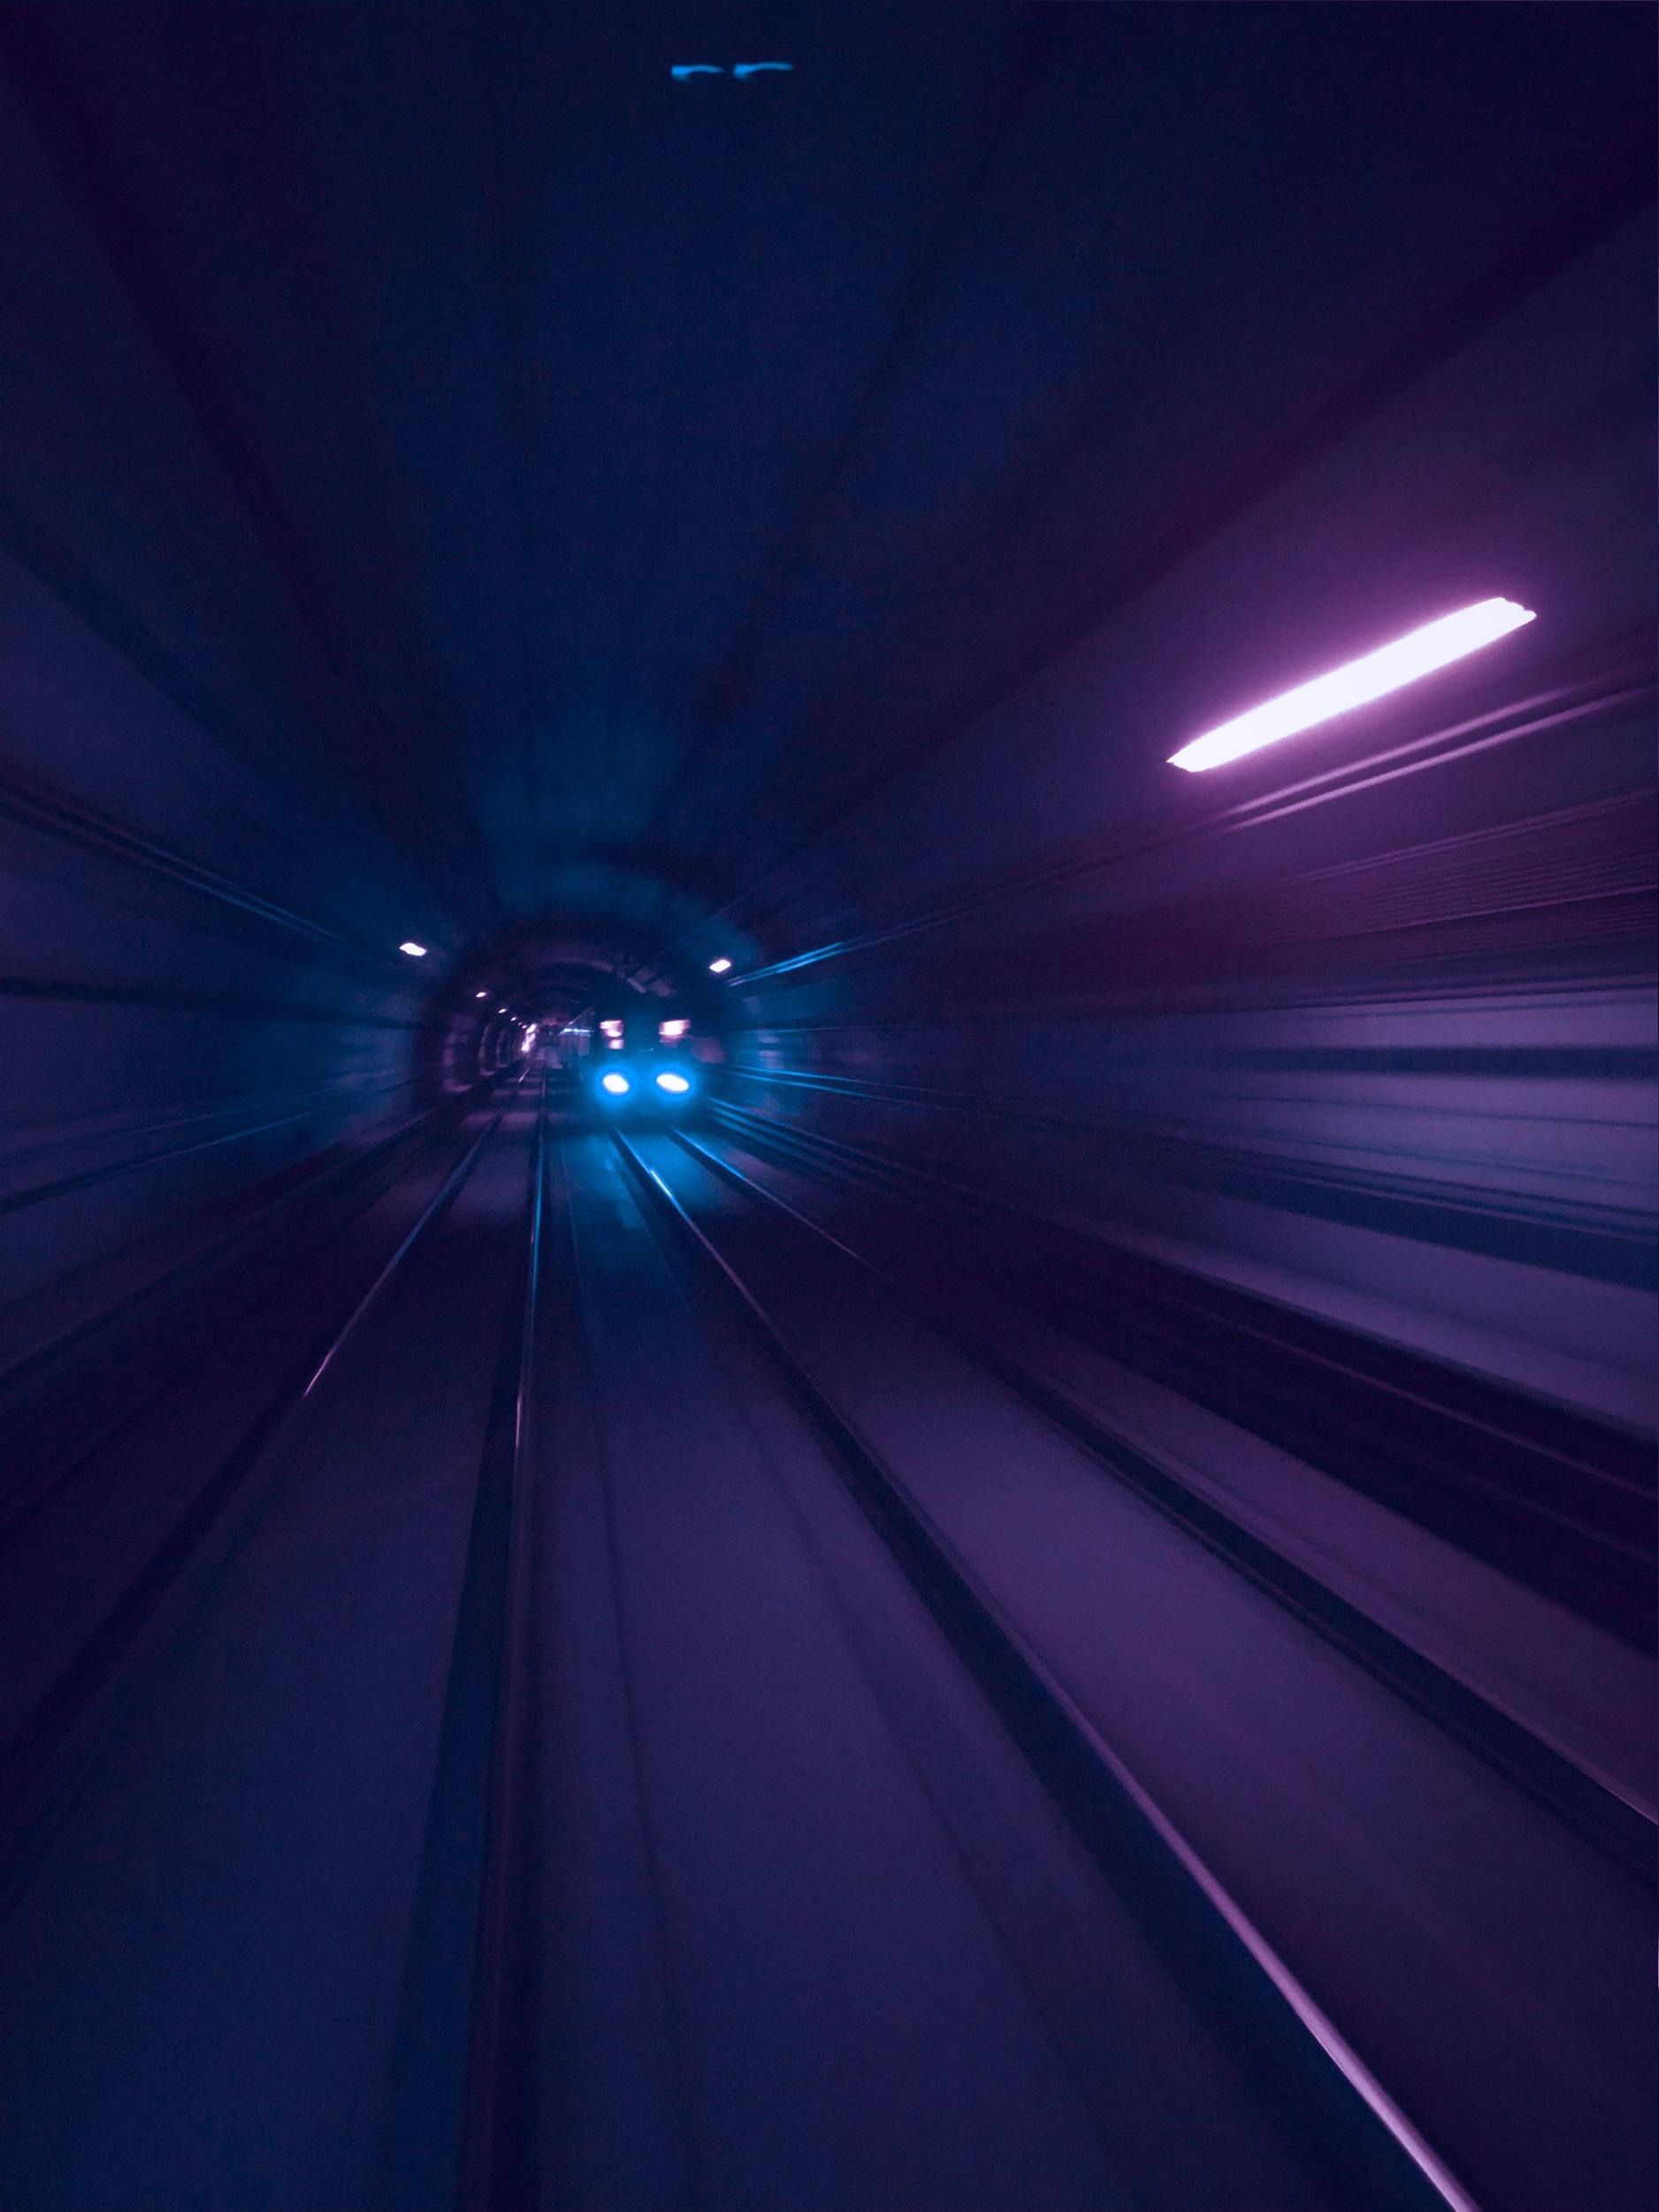 Purple Light Photo of Tunnel